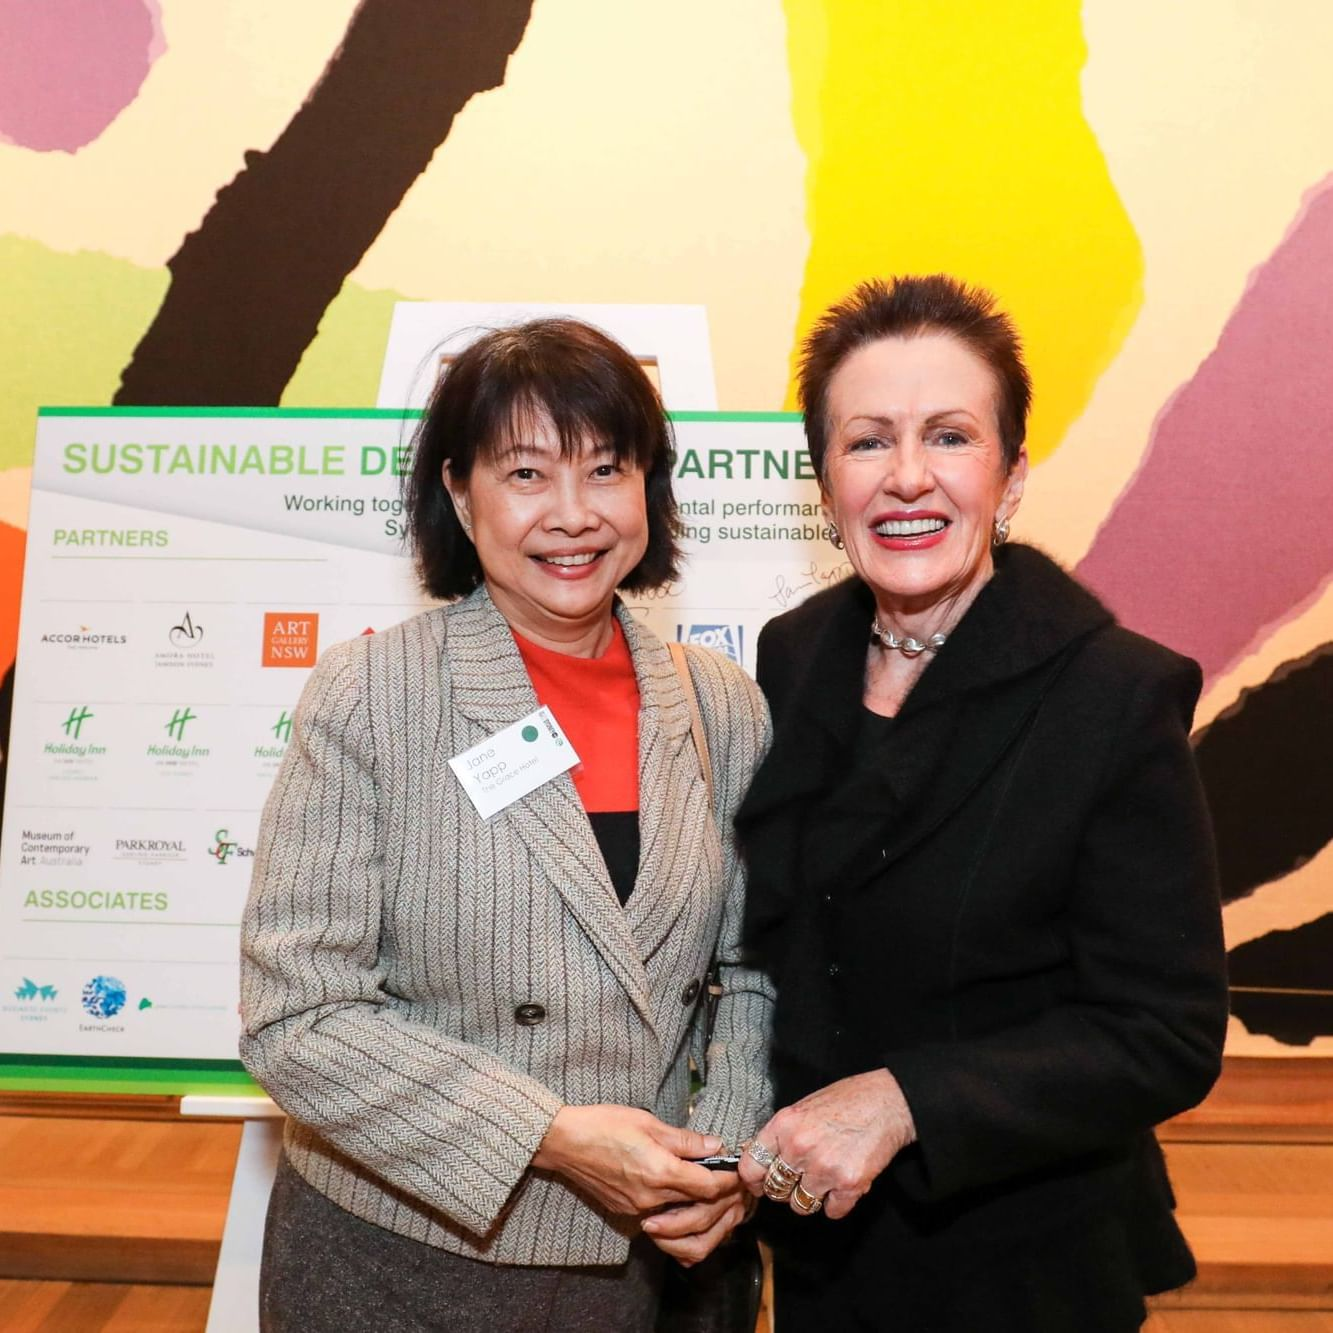 Sustainable Destination Partnership